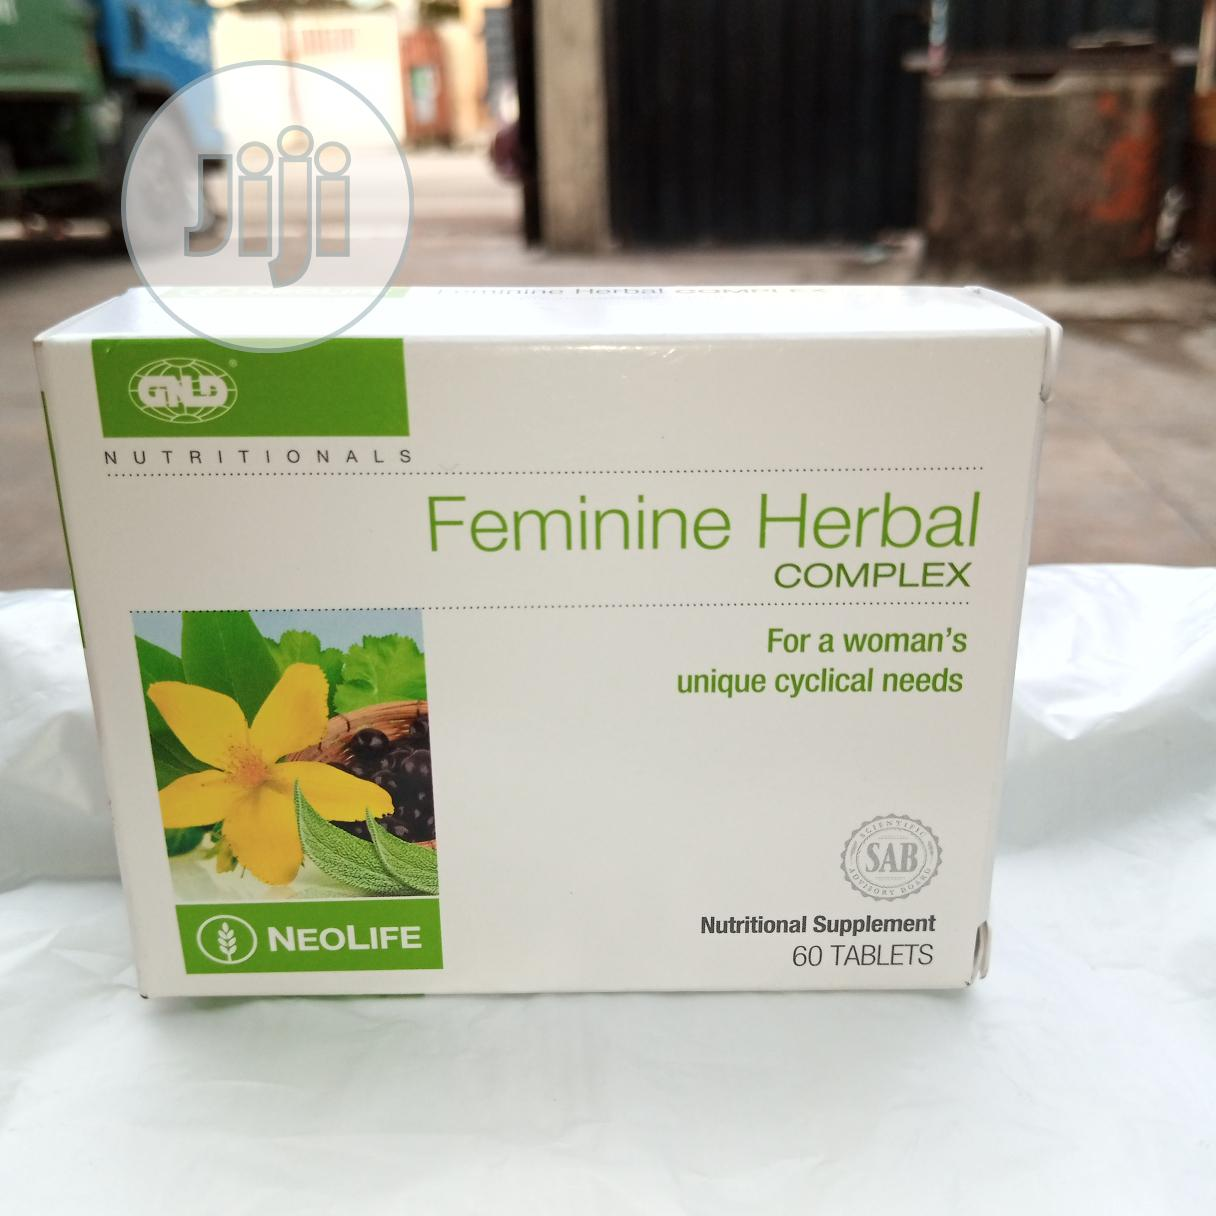 GNLD Feminine Herbal Complex